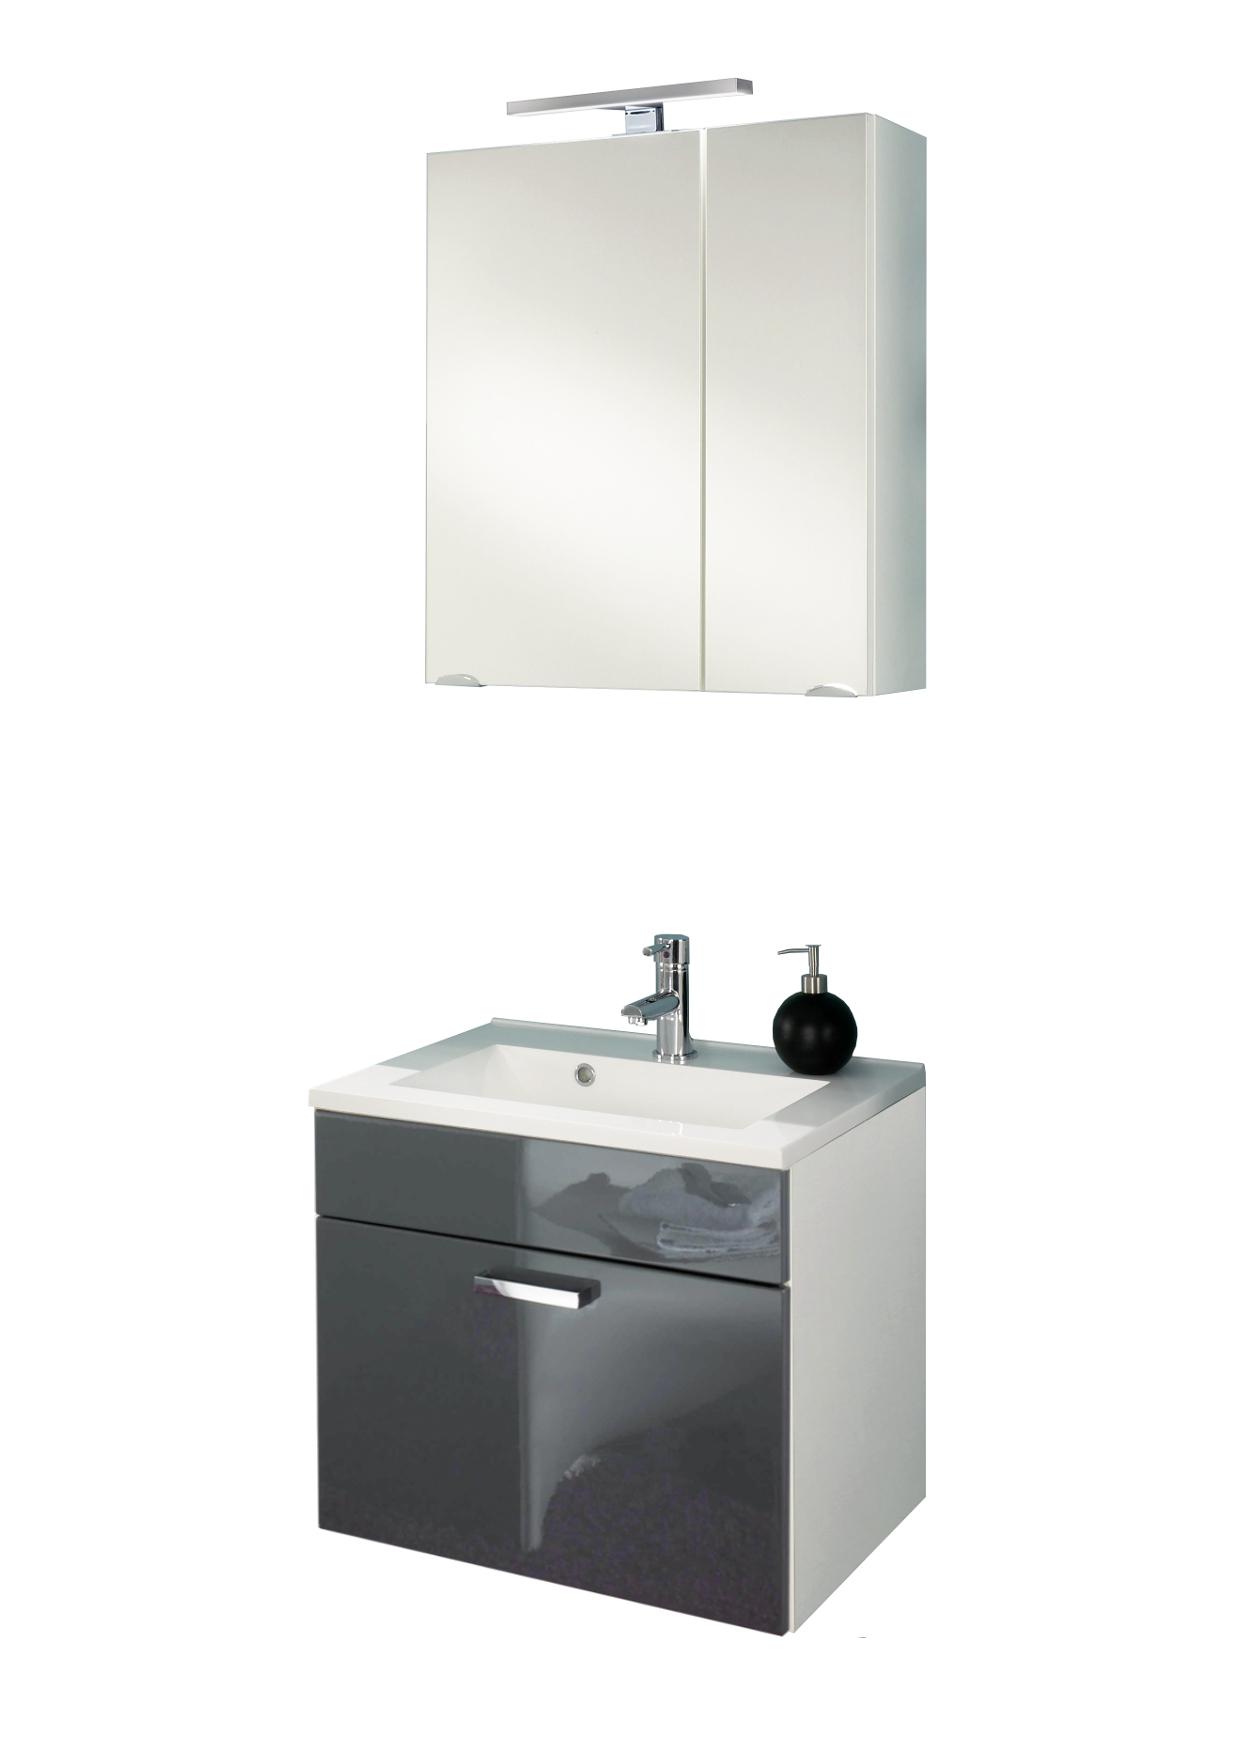 badm bel set marano mit spiegelschrank 4 teilig 60. Black Bedroom Furniture Sets. Home Design Ideas